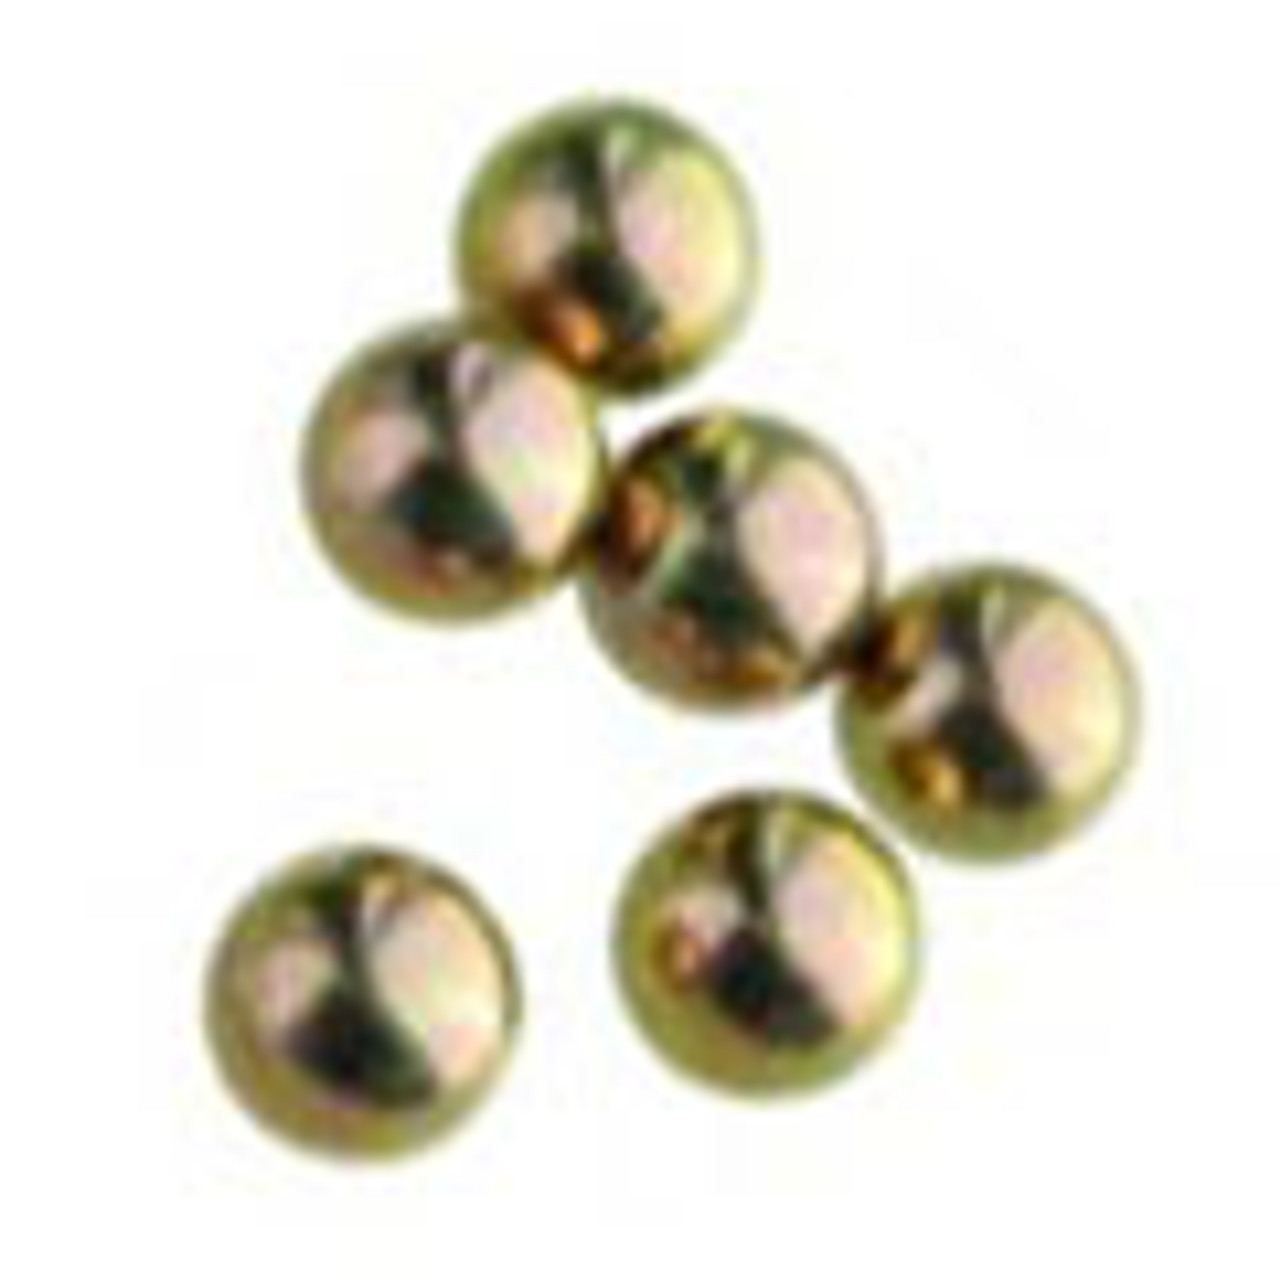 Slingshot Ammo & Balls